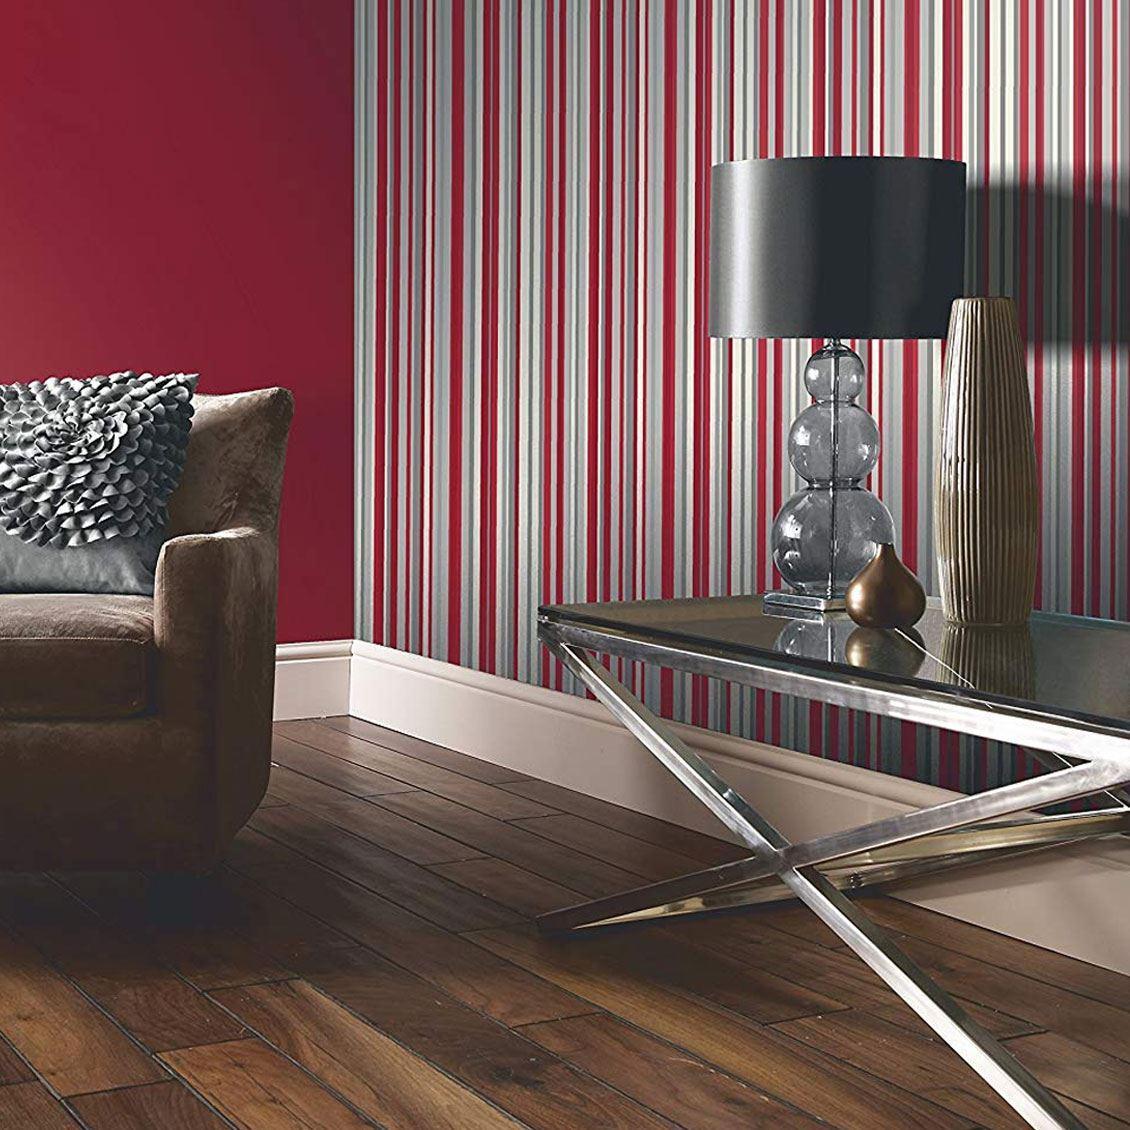 Details about sophia stripe wallpaper red white metallic silver striped modern luxury arthouse